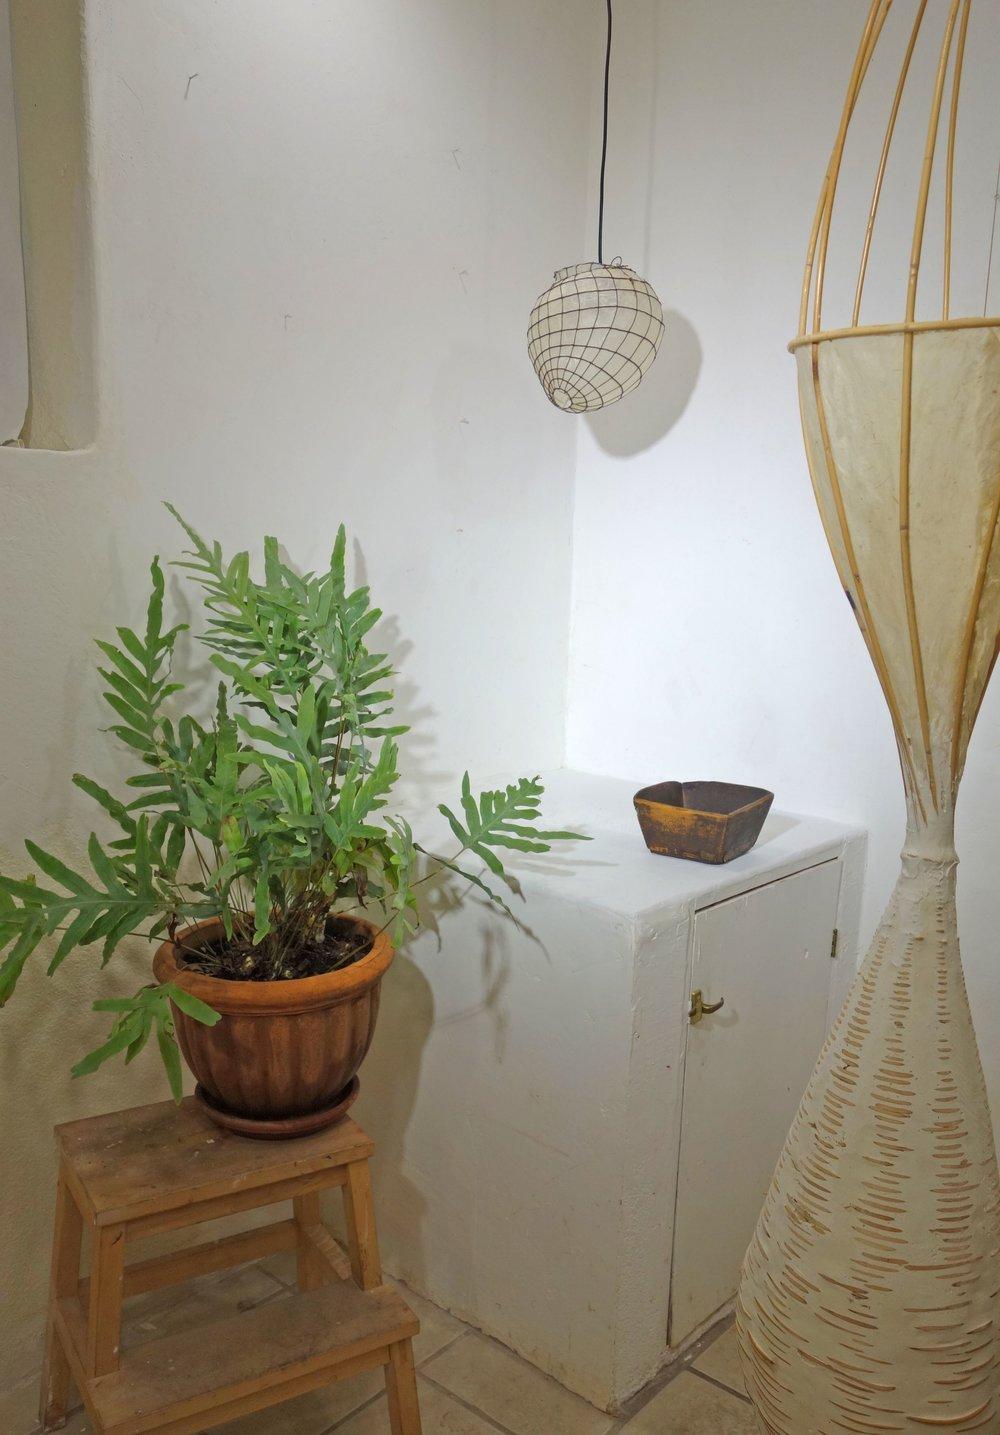 G-Telcocci-pendant-light-in-studio.jpg